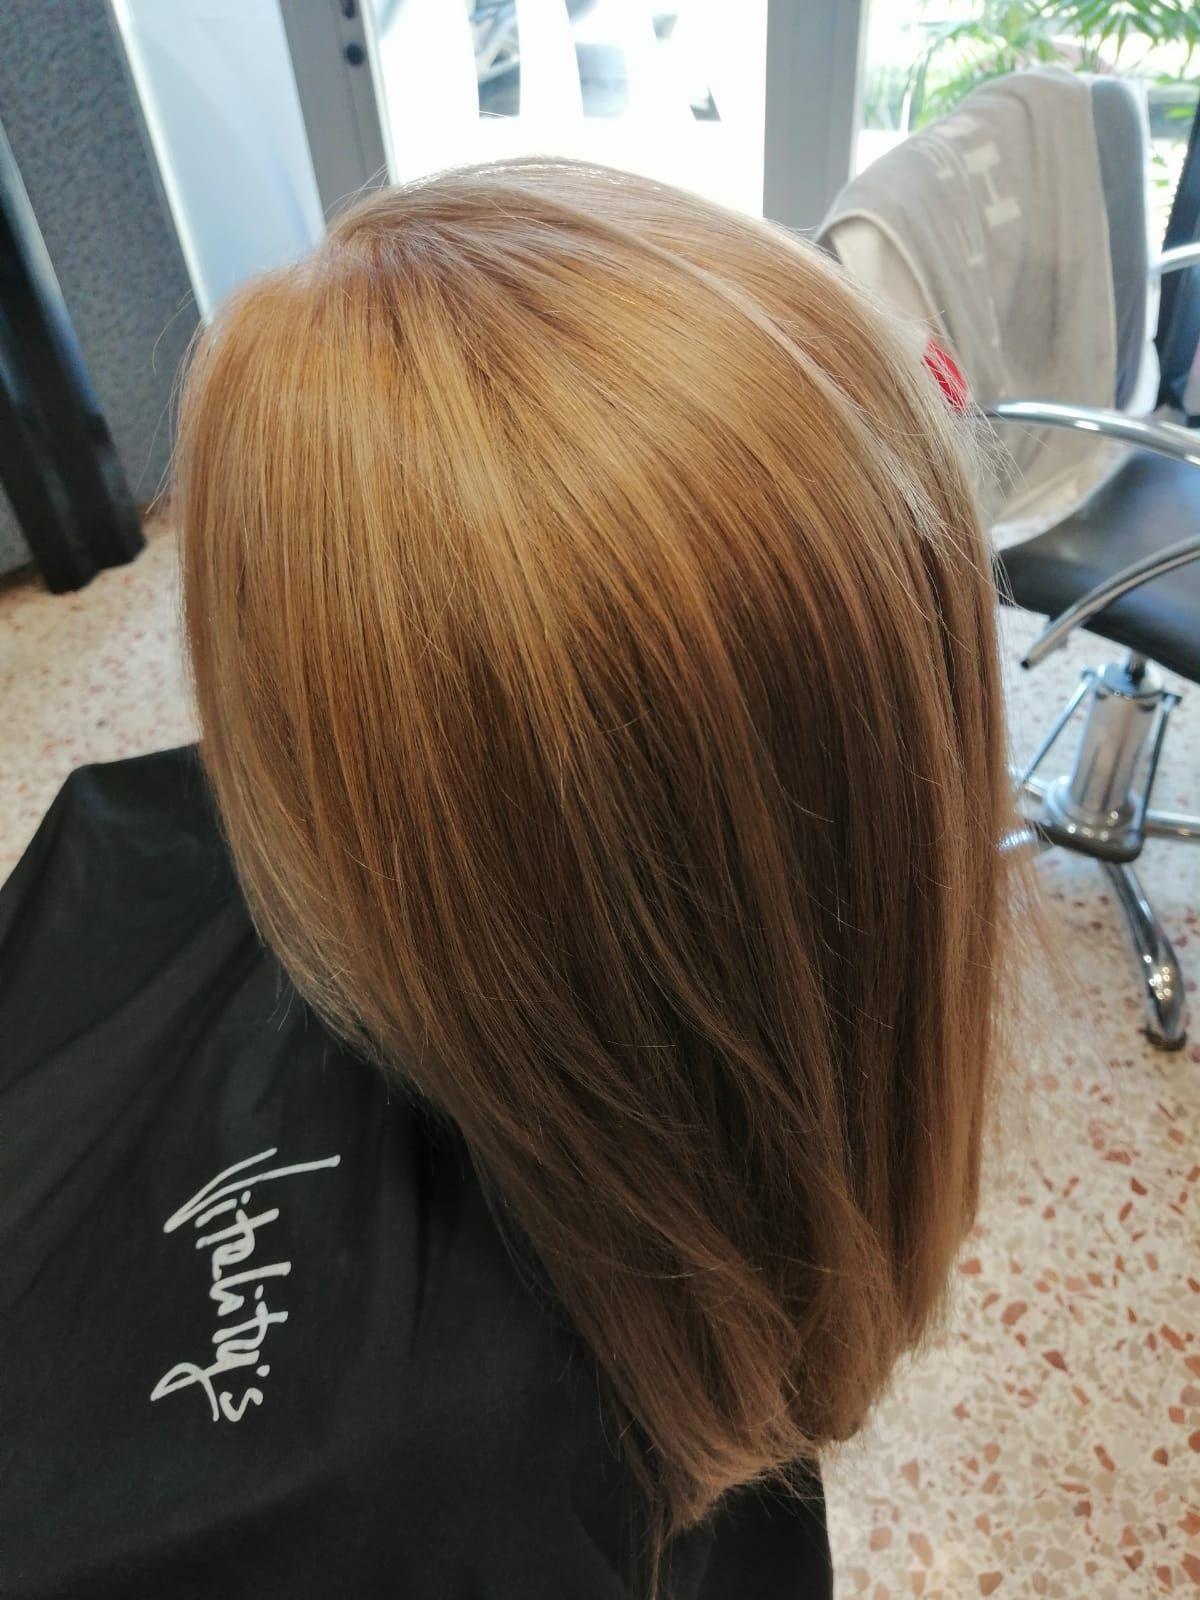 Foto 10 de Peluquería y maquillaje en    Lucian Hair&Beauty